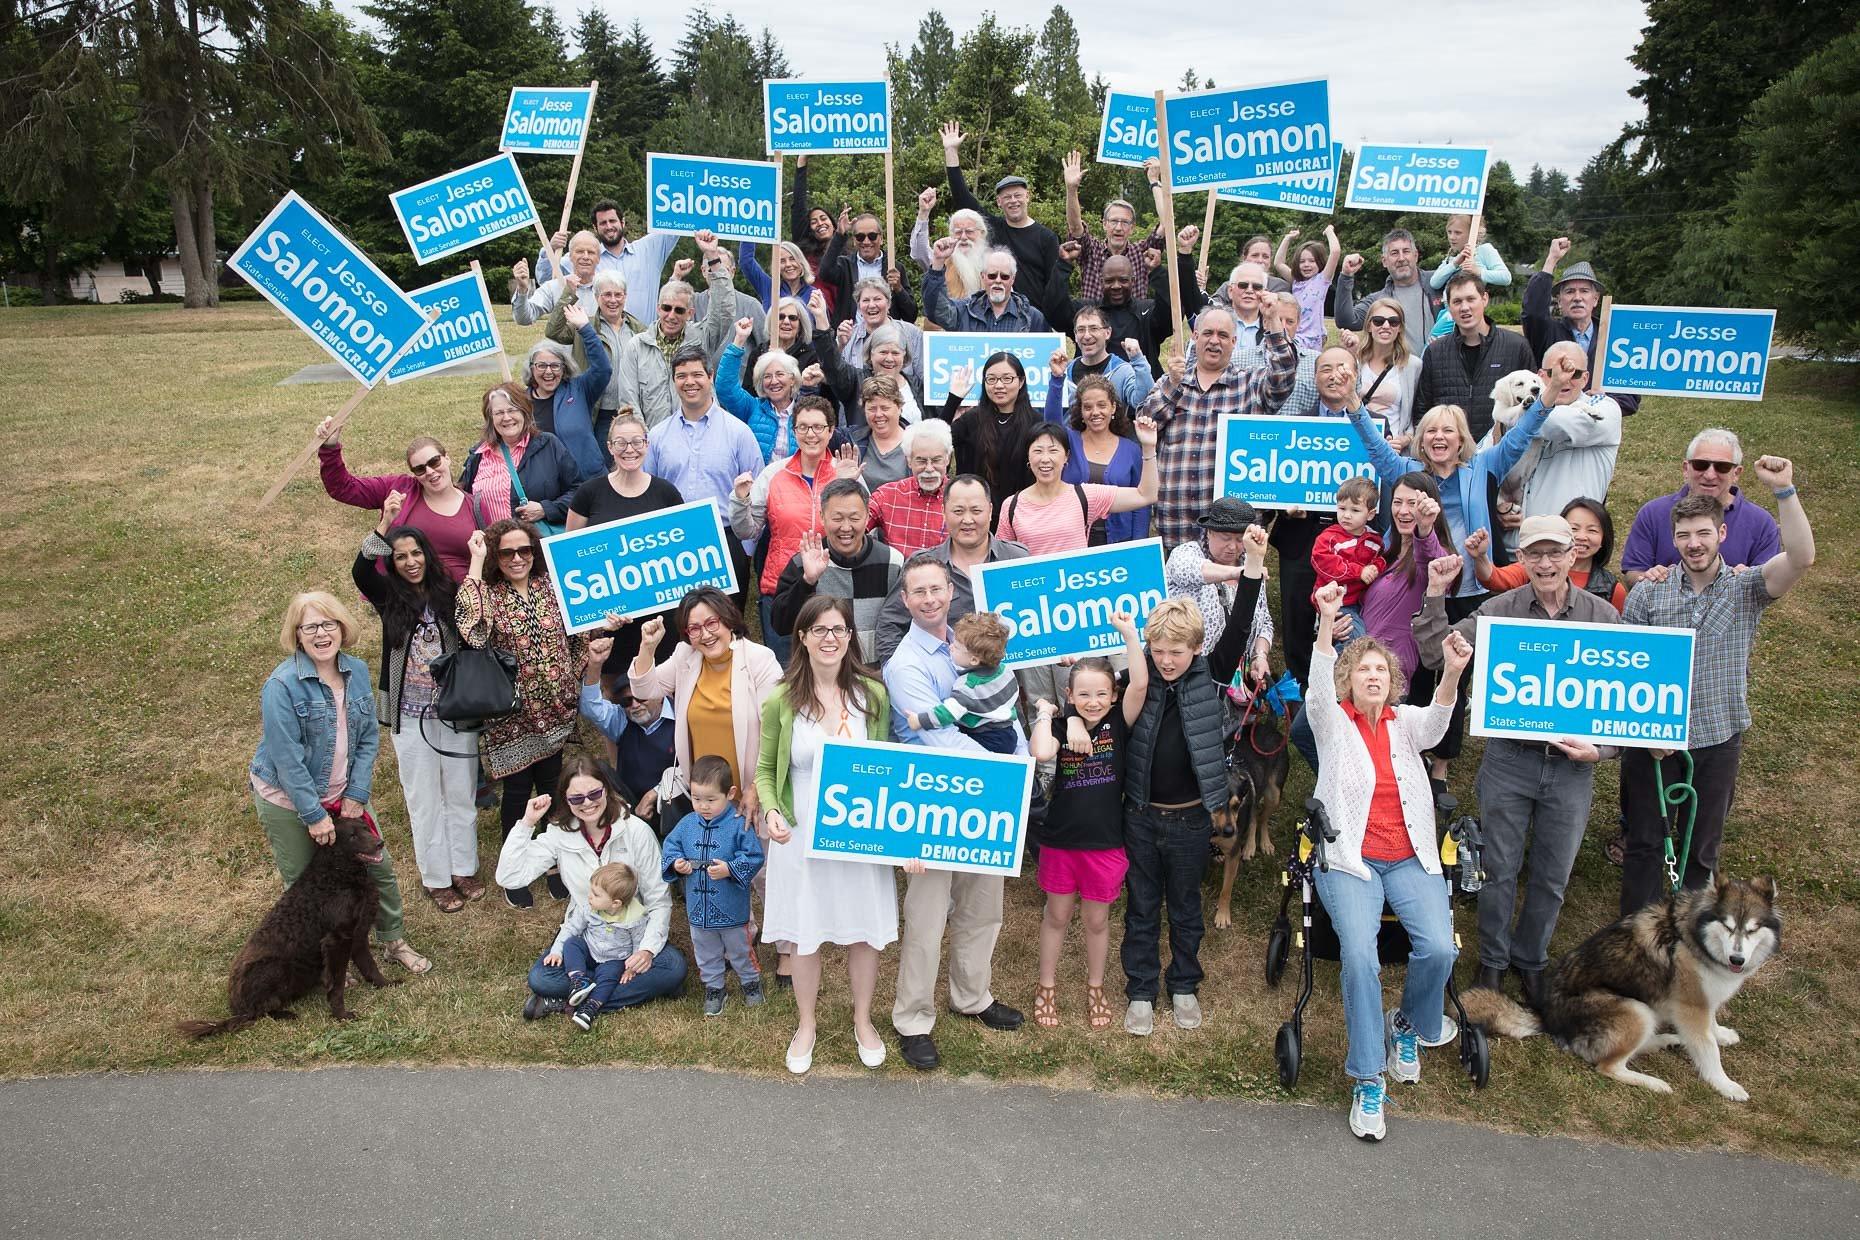 jesse-salomon-with-supporters.jpg